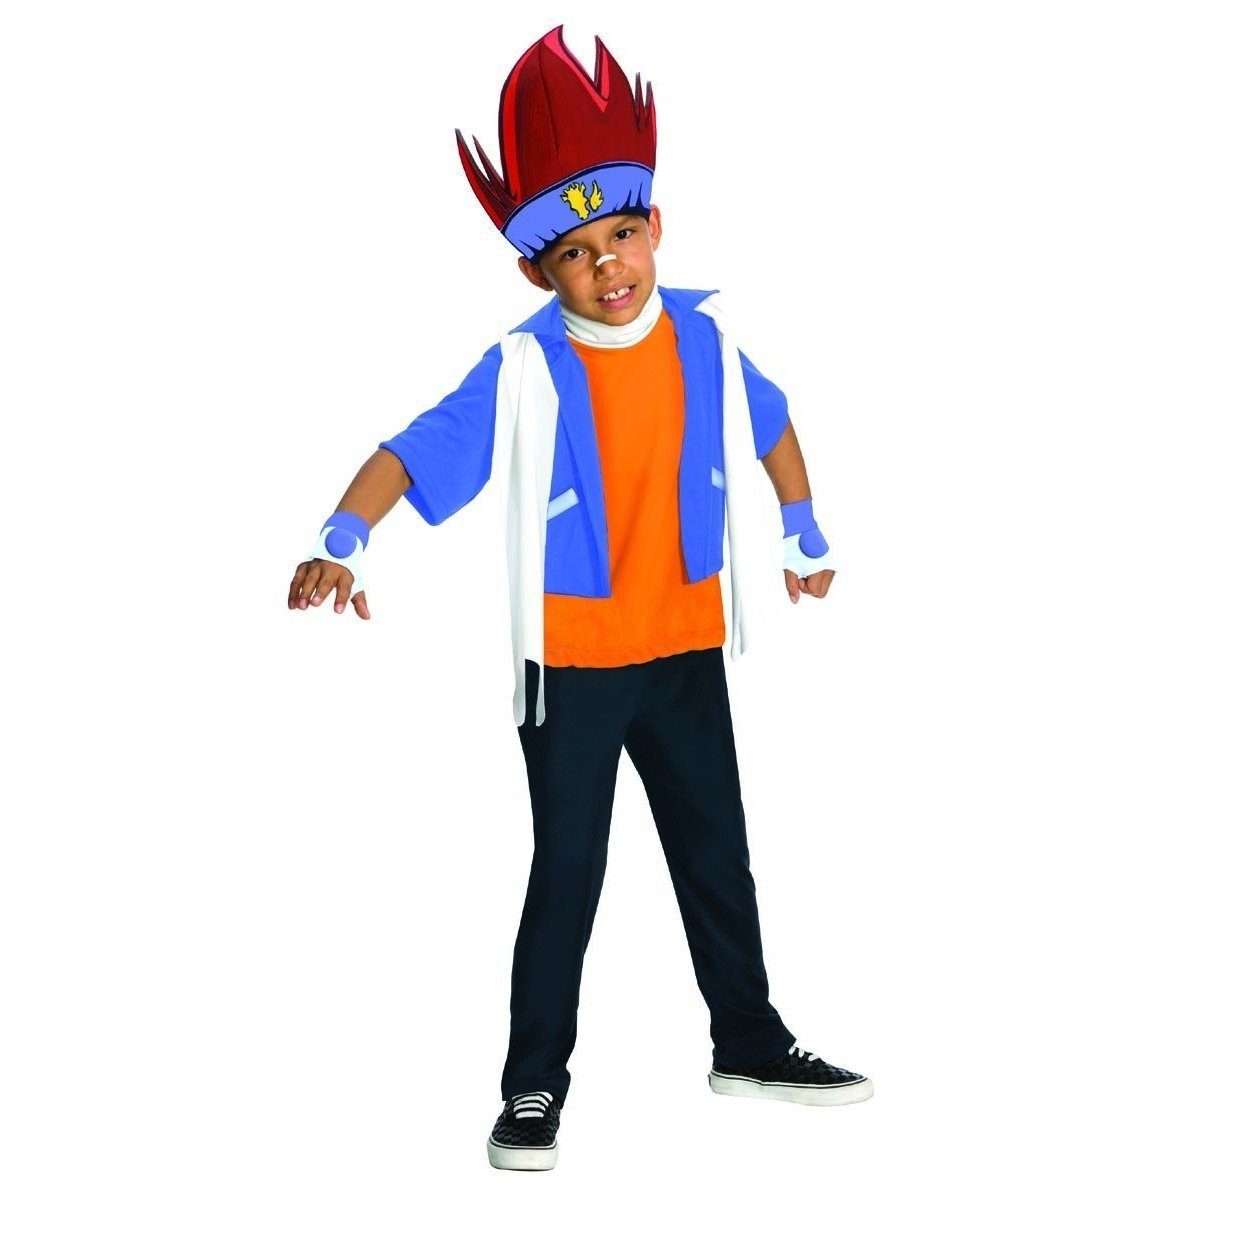 Gingka Beyblade Metal Fusion Anime Cartoon Boys Child Halloween Costume Blue (XL) (14-16)